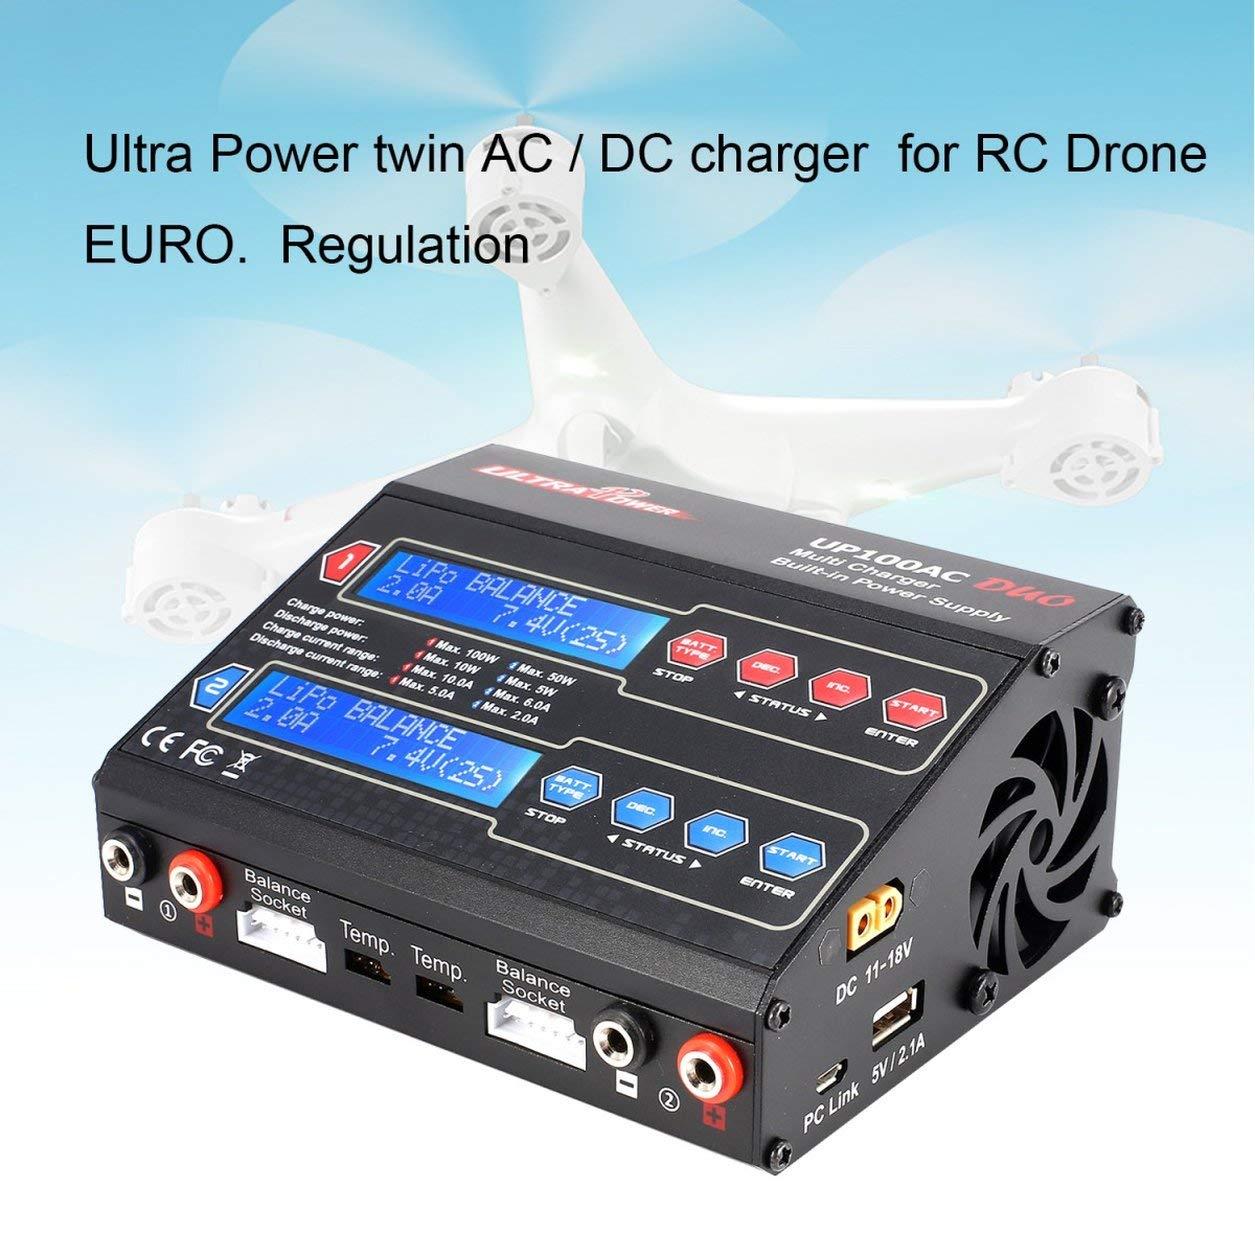 Dailyinshop Ultra Power UP100AC 100W zyklisches LiIo / LiPo / Life / NiMH / Nicd-Ladegerät (Farbe: Schwarz)